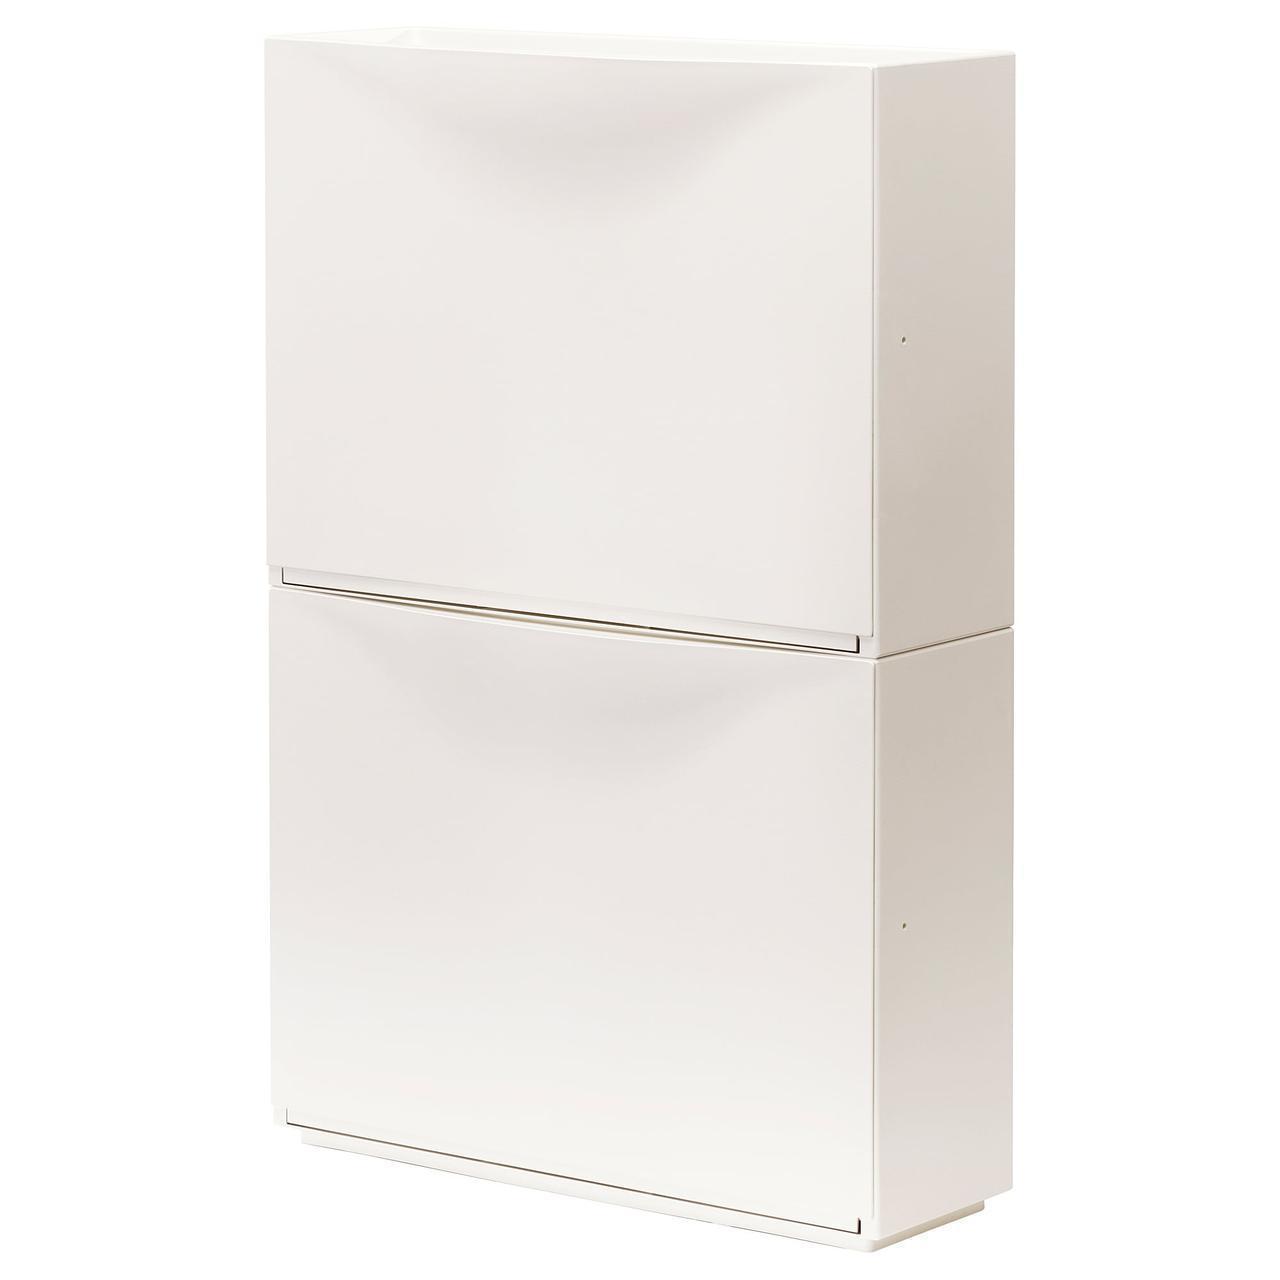 Шкафчик для обуви IKEA TRONES 52x39 см белый 003.973.07